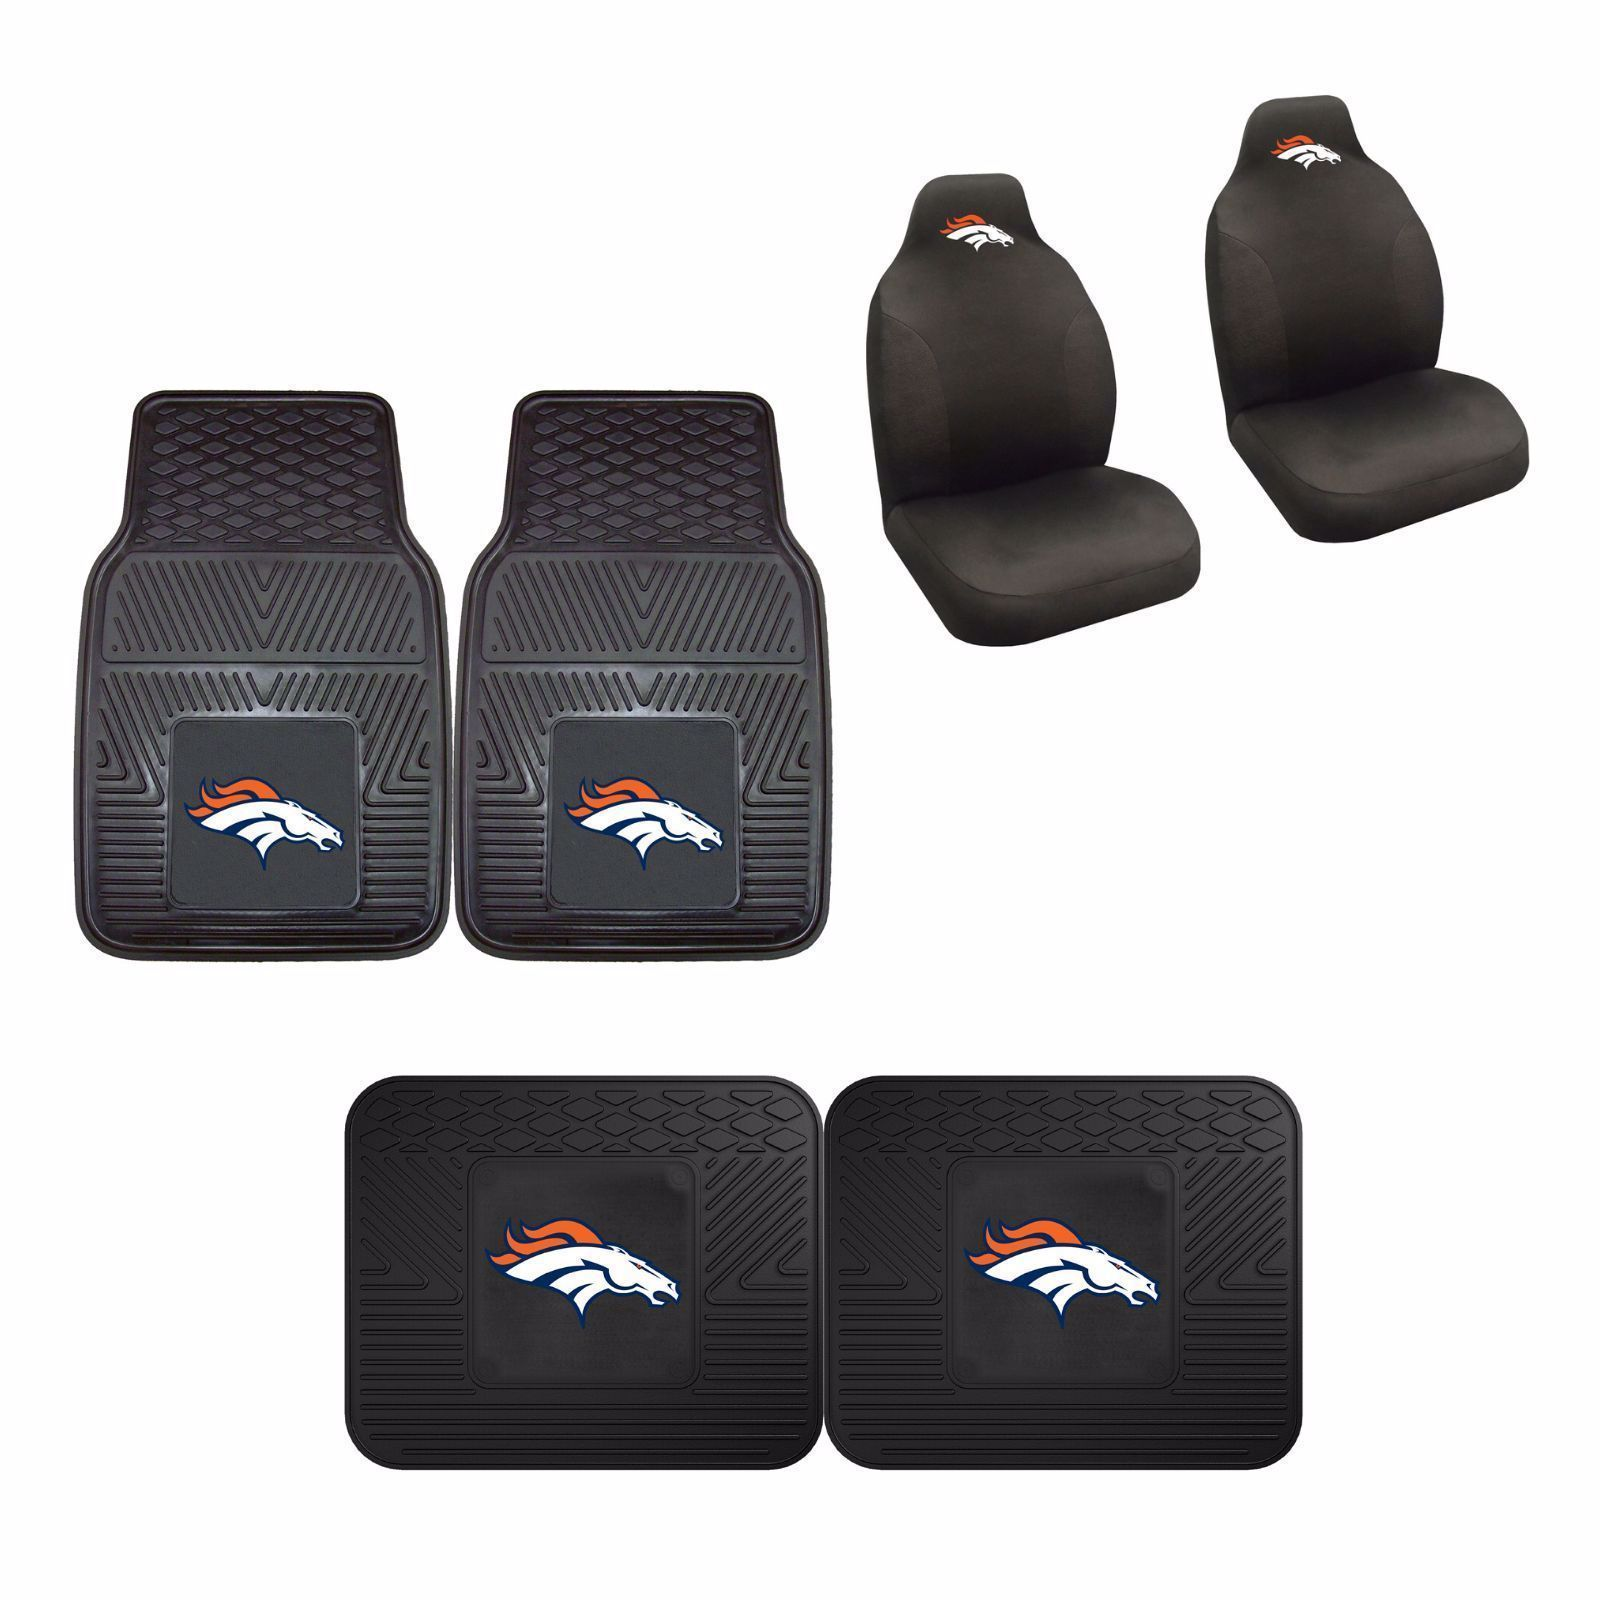 Denver Broncos Car Accessories Car Mats Seat Covers In 2020 Bronco Car Car Accessories Seat Covers